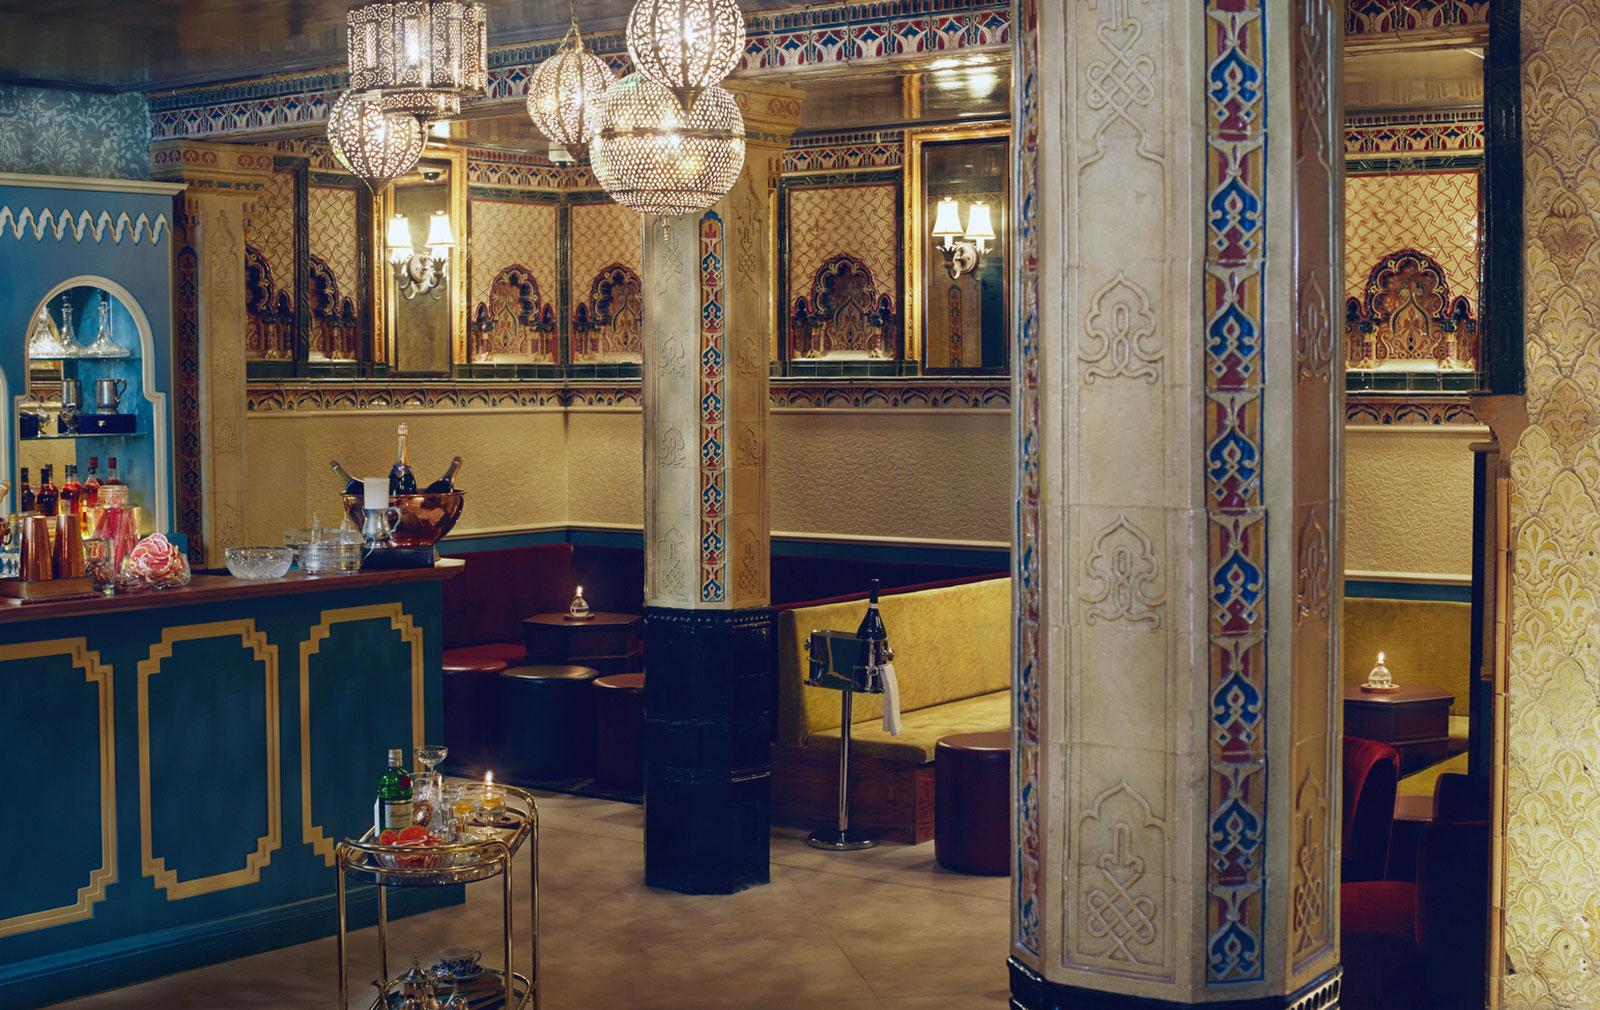 Victorian Bath House in Bishopsgate